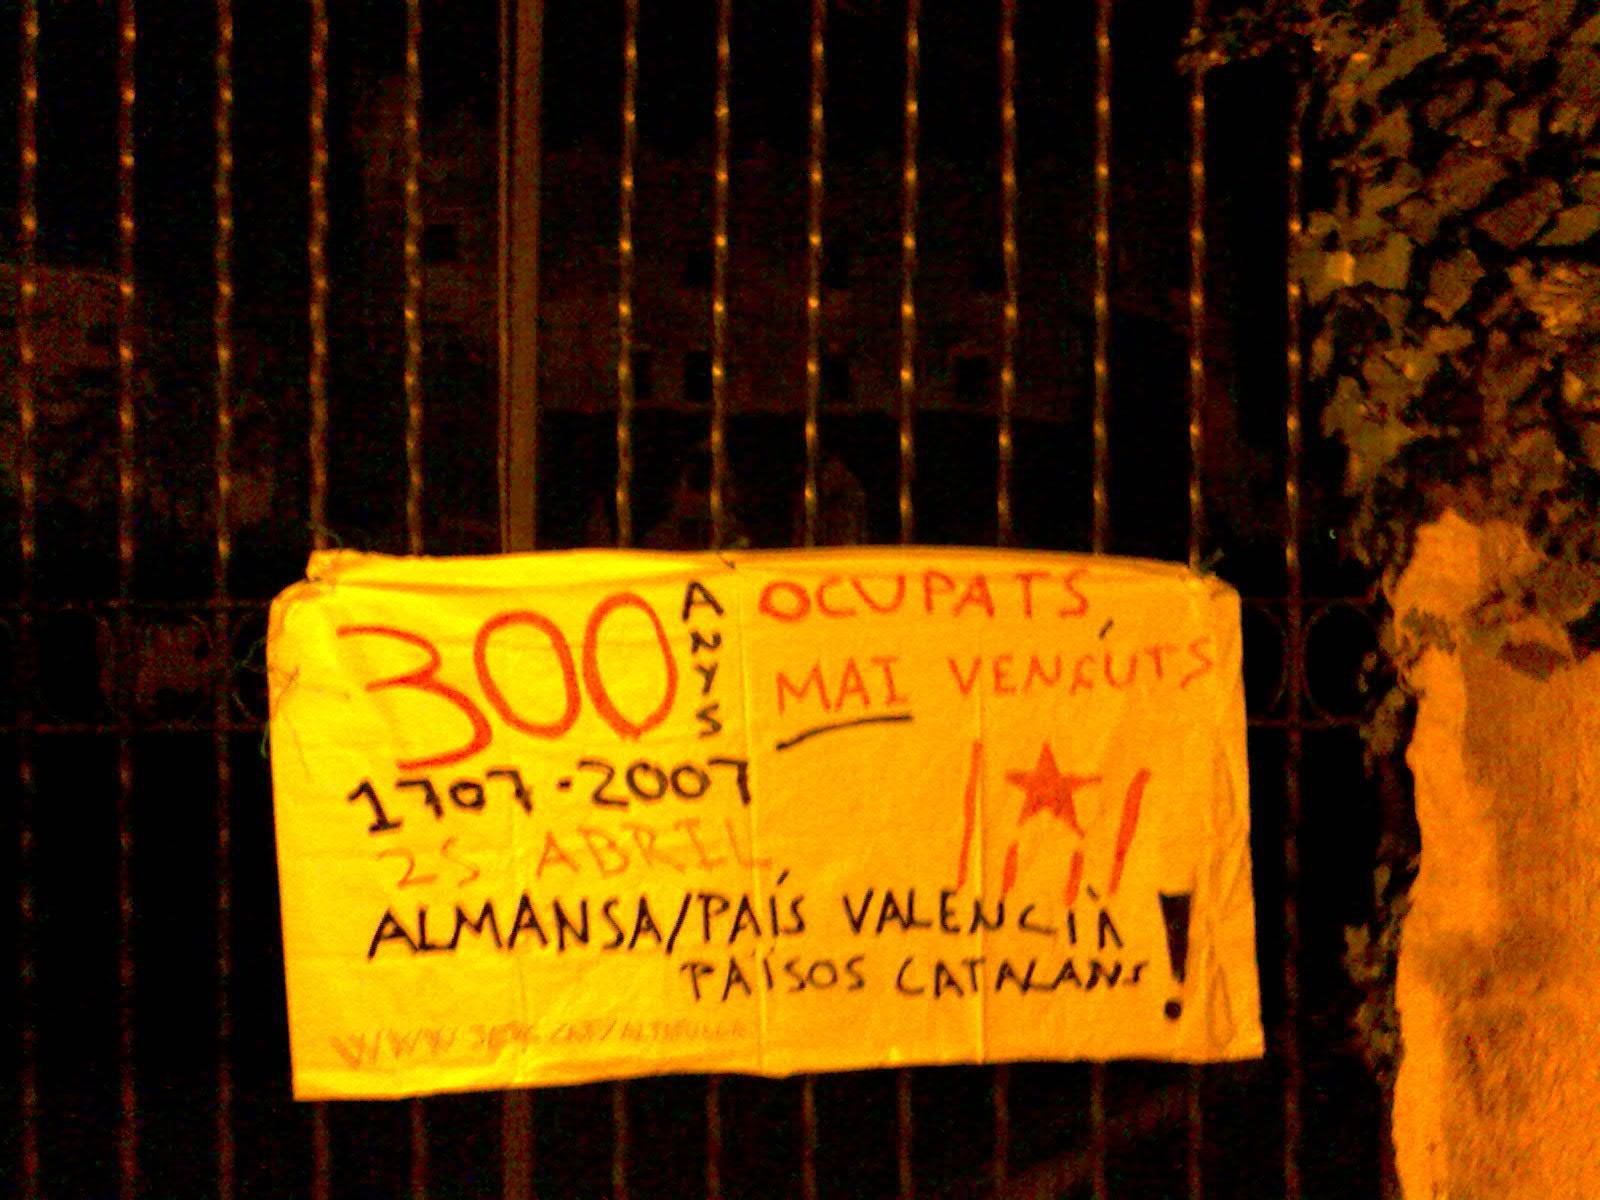 Penjada de pancartes 25 d'abril